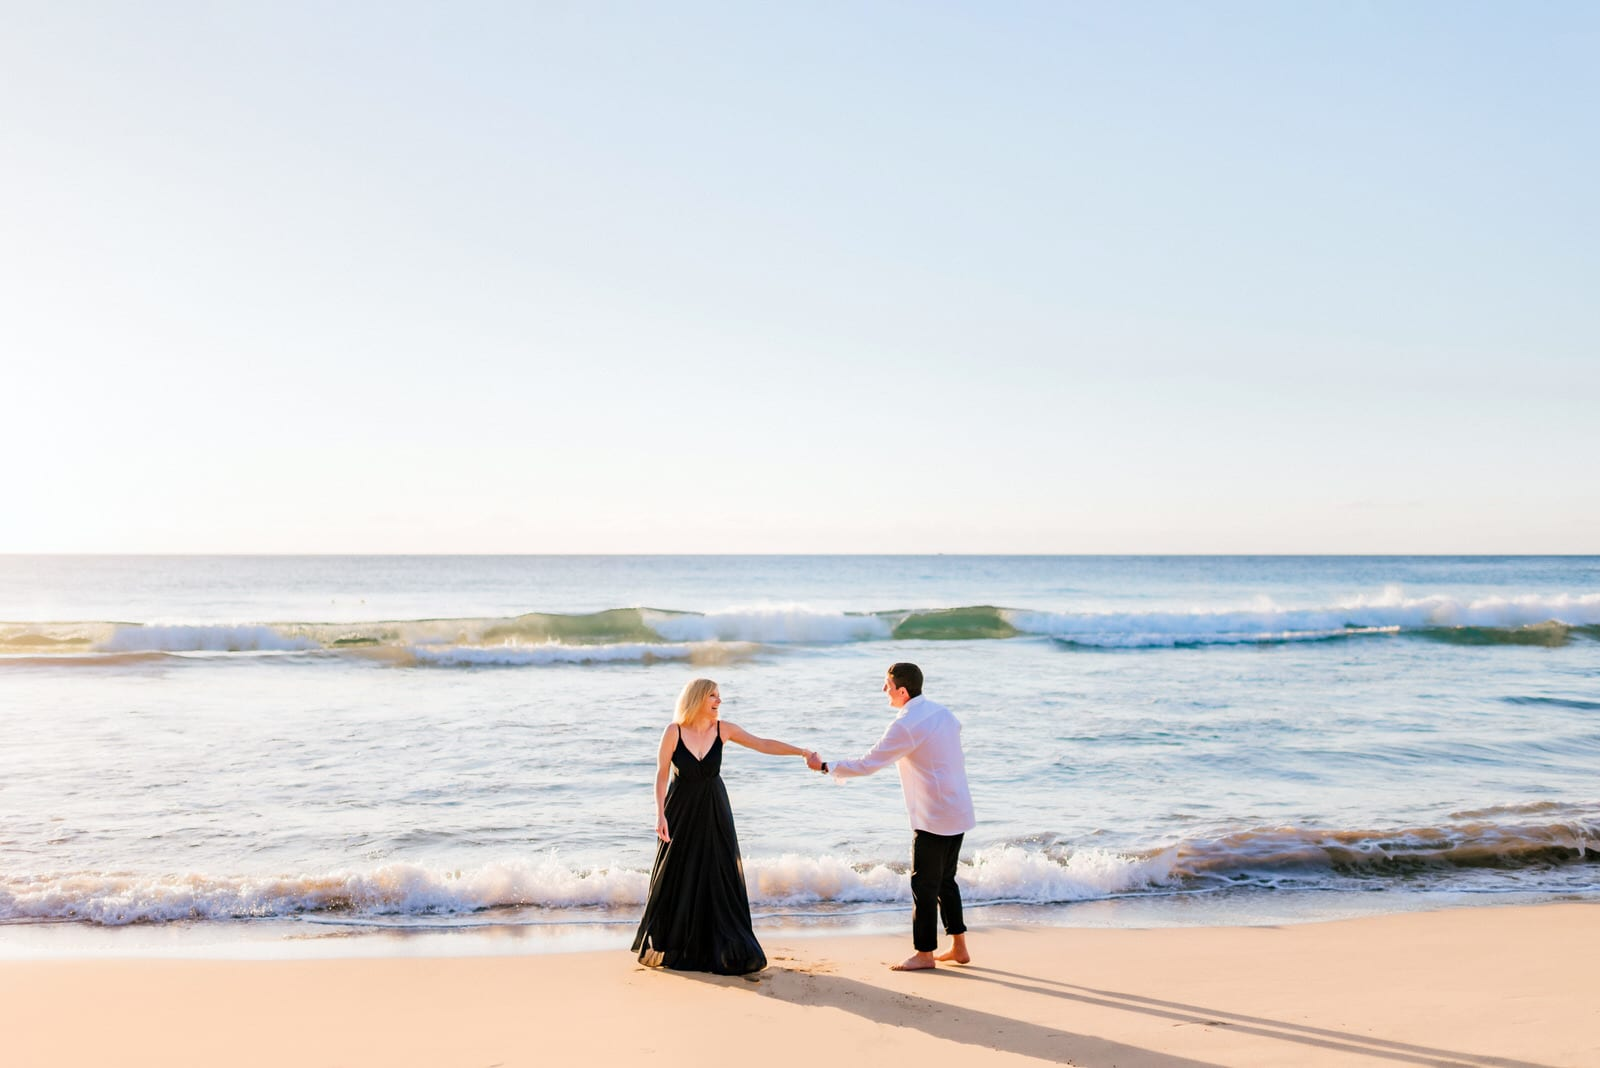 kona-engagement-photographer-navy-dress-sunset-7.jpg